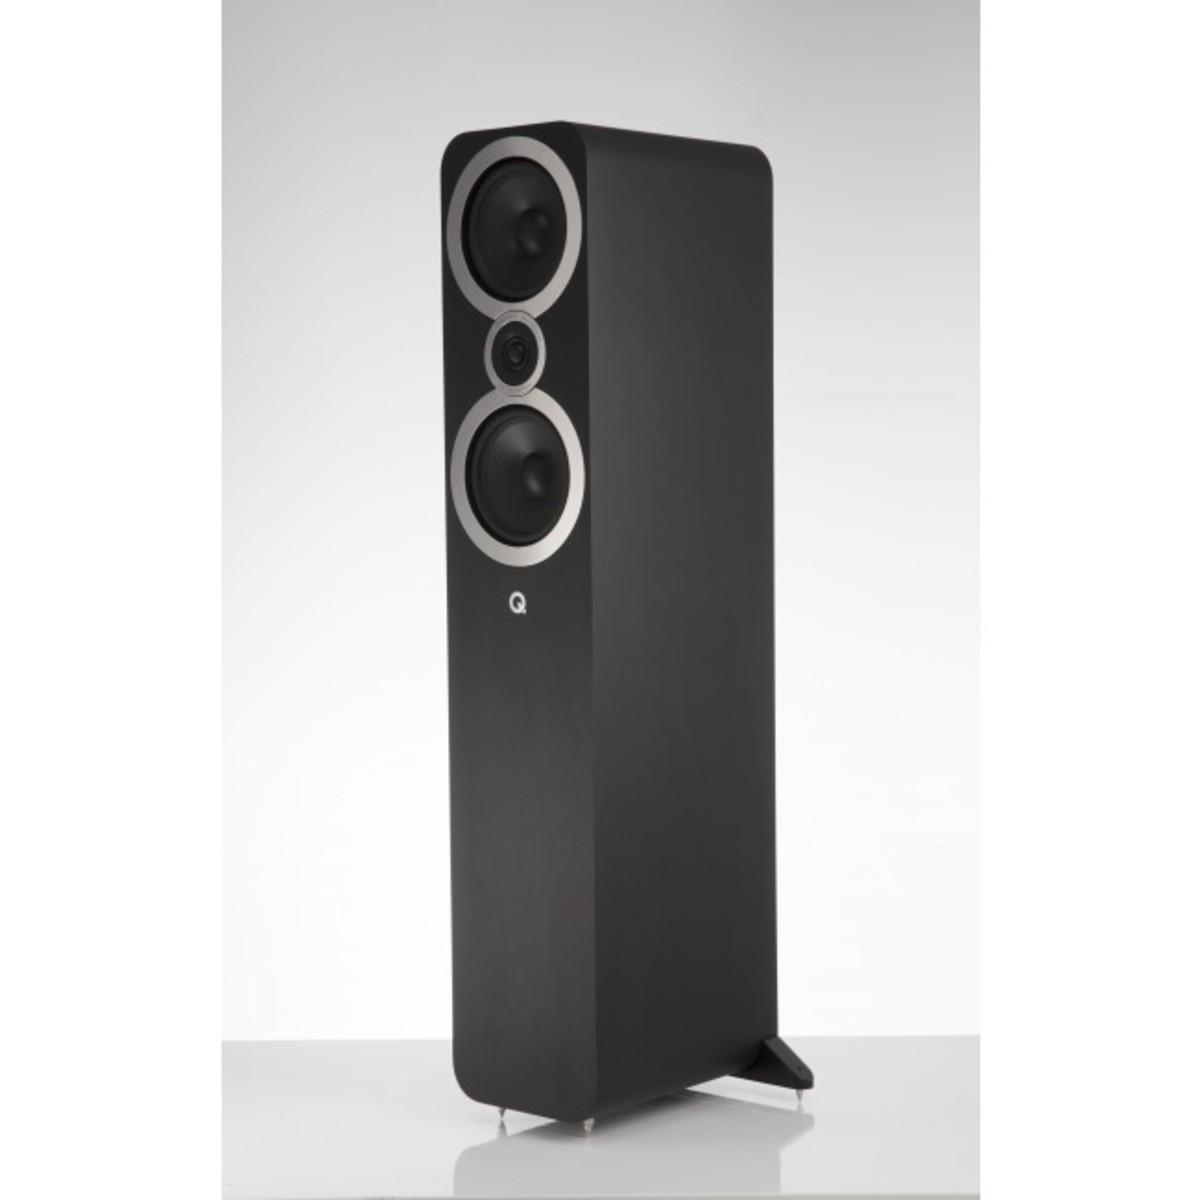 Q Acoustics 3050I GRAPHITE GREY Floorstand Speakers, Graphite Grey